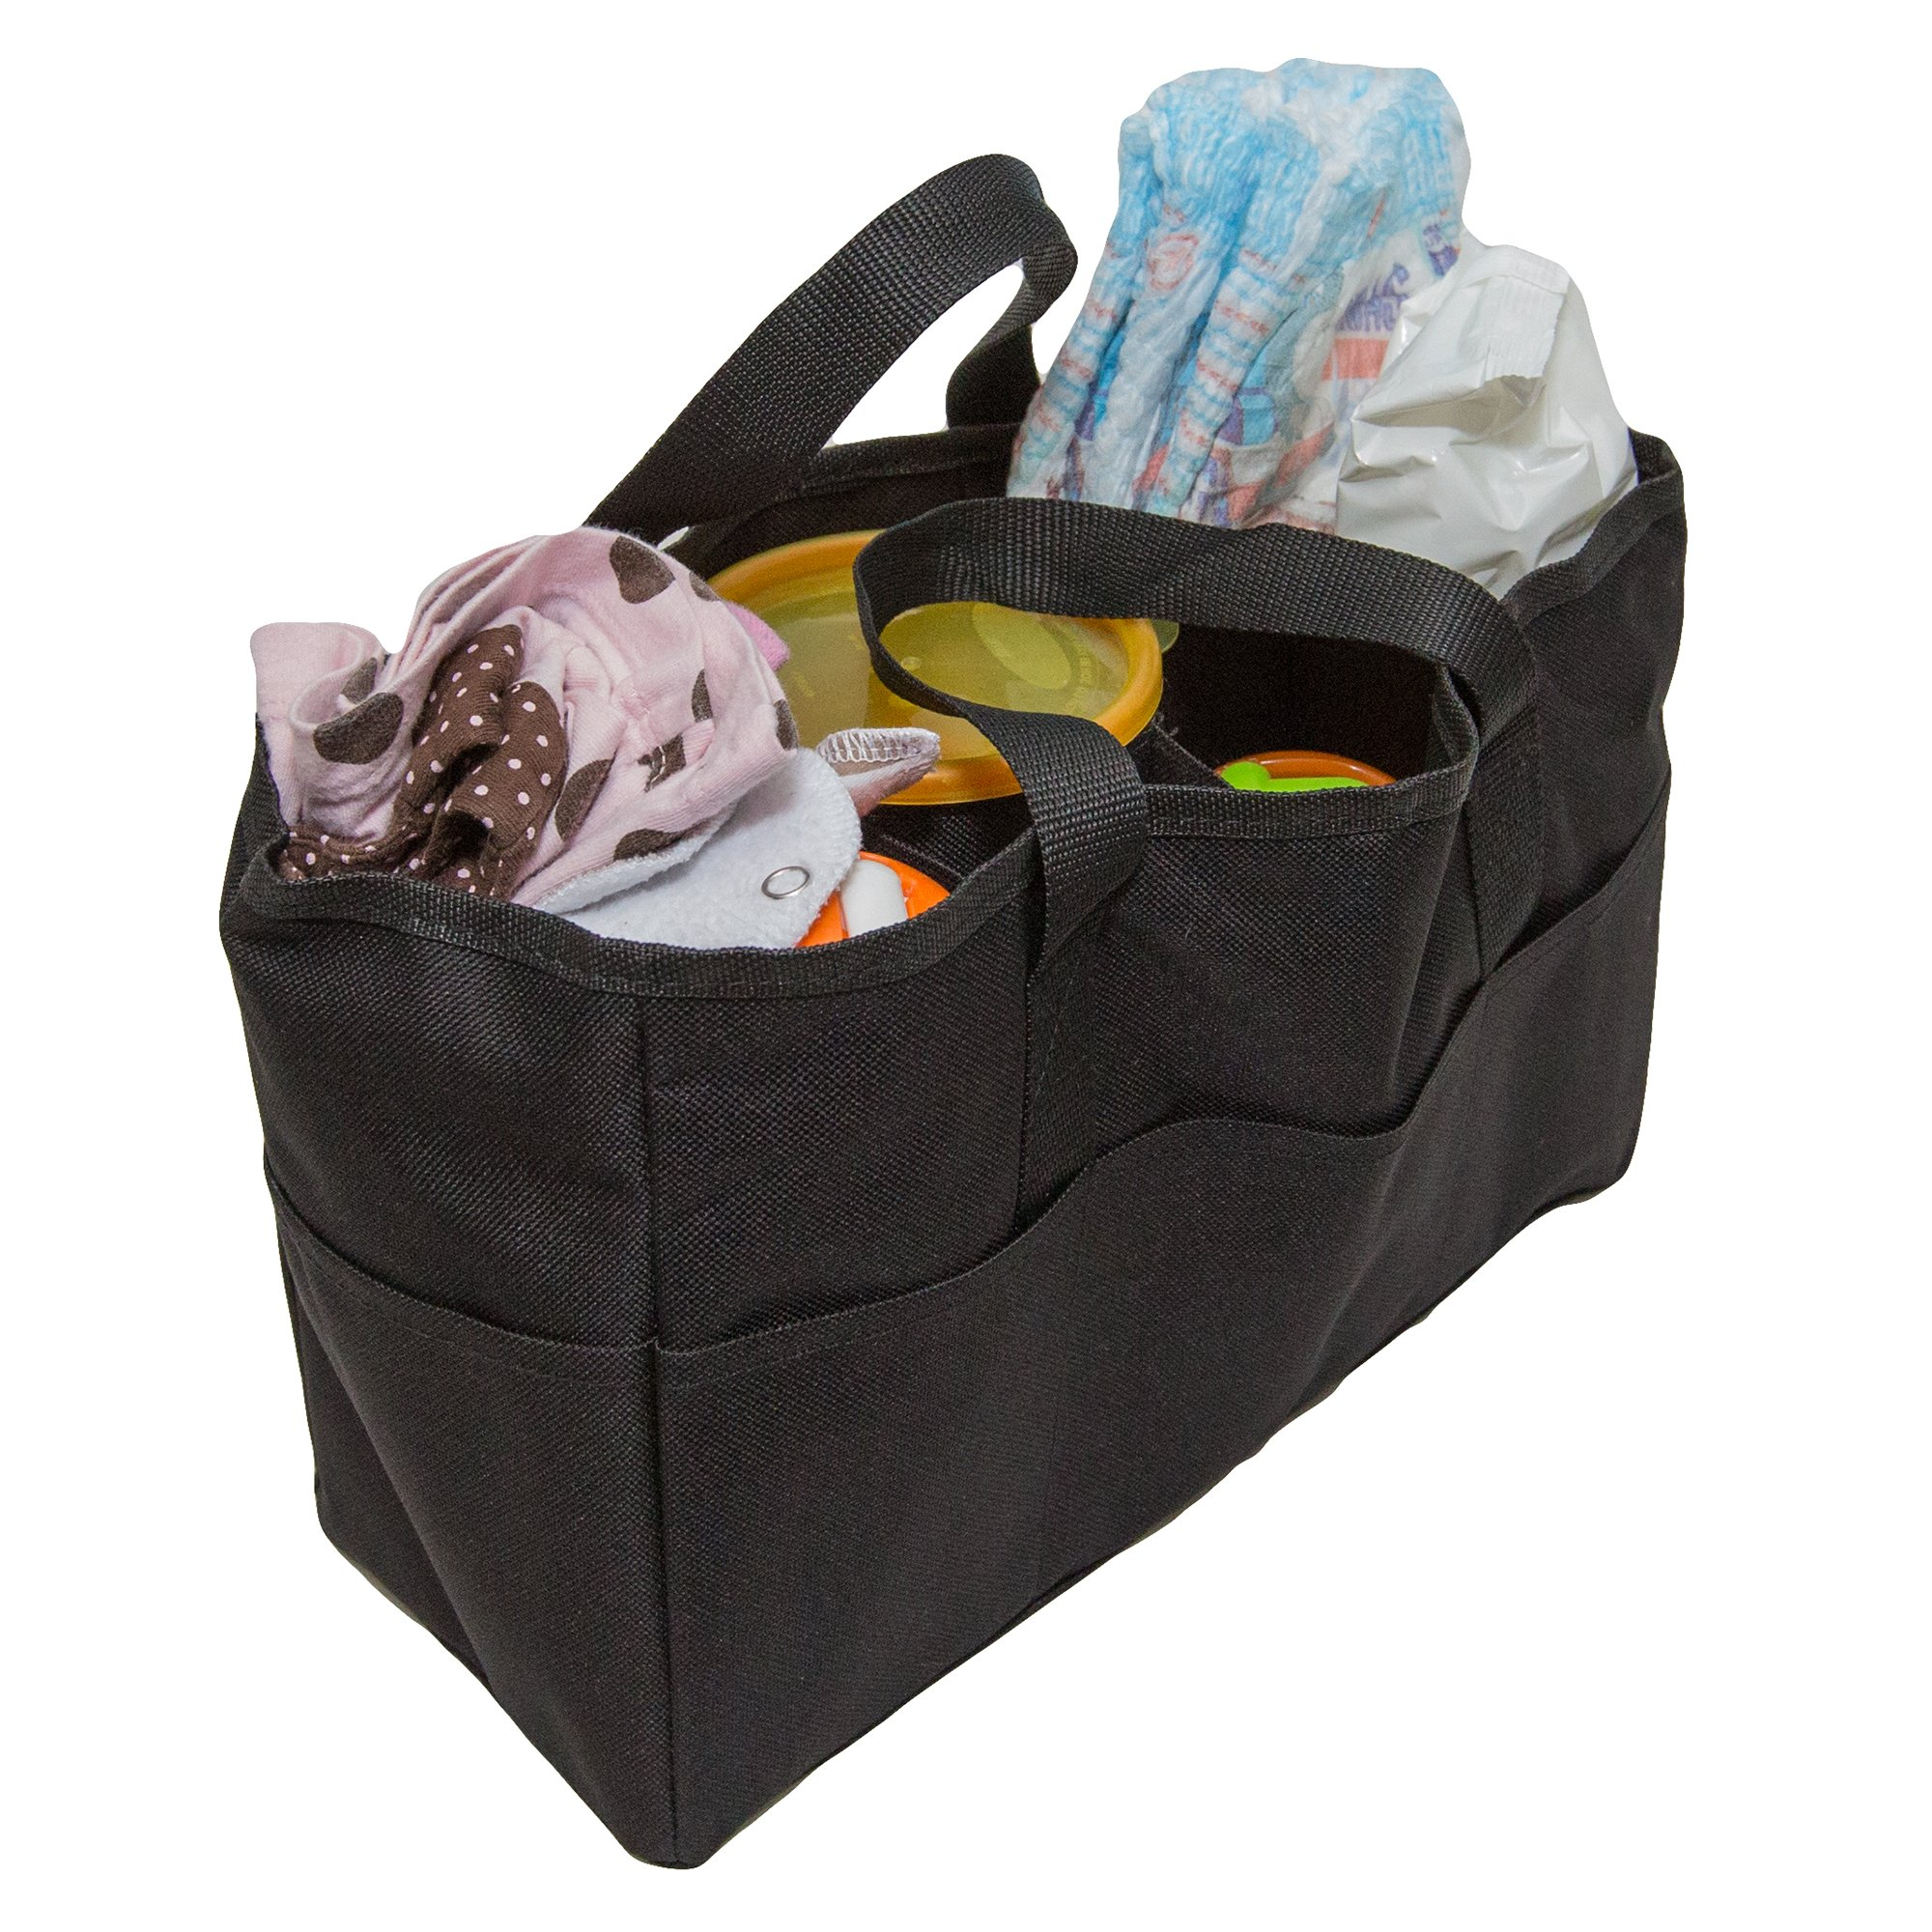 Diaper Organizer Outside Storage Pockets